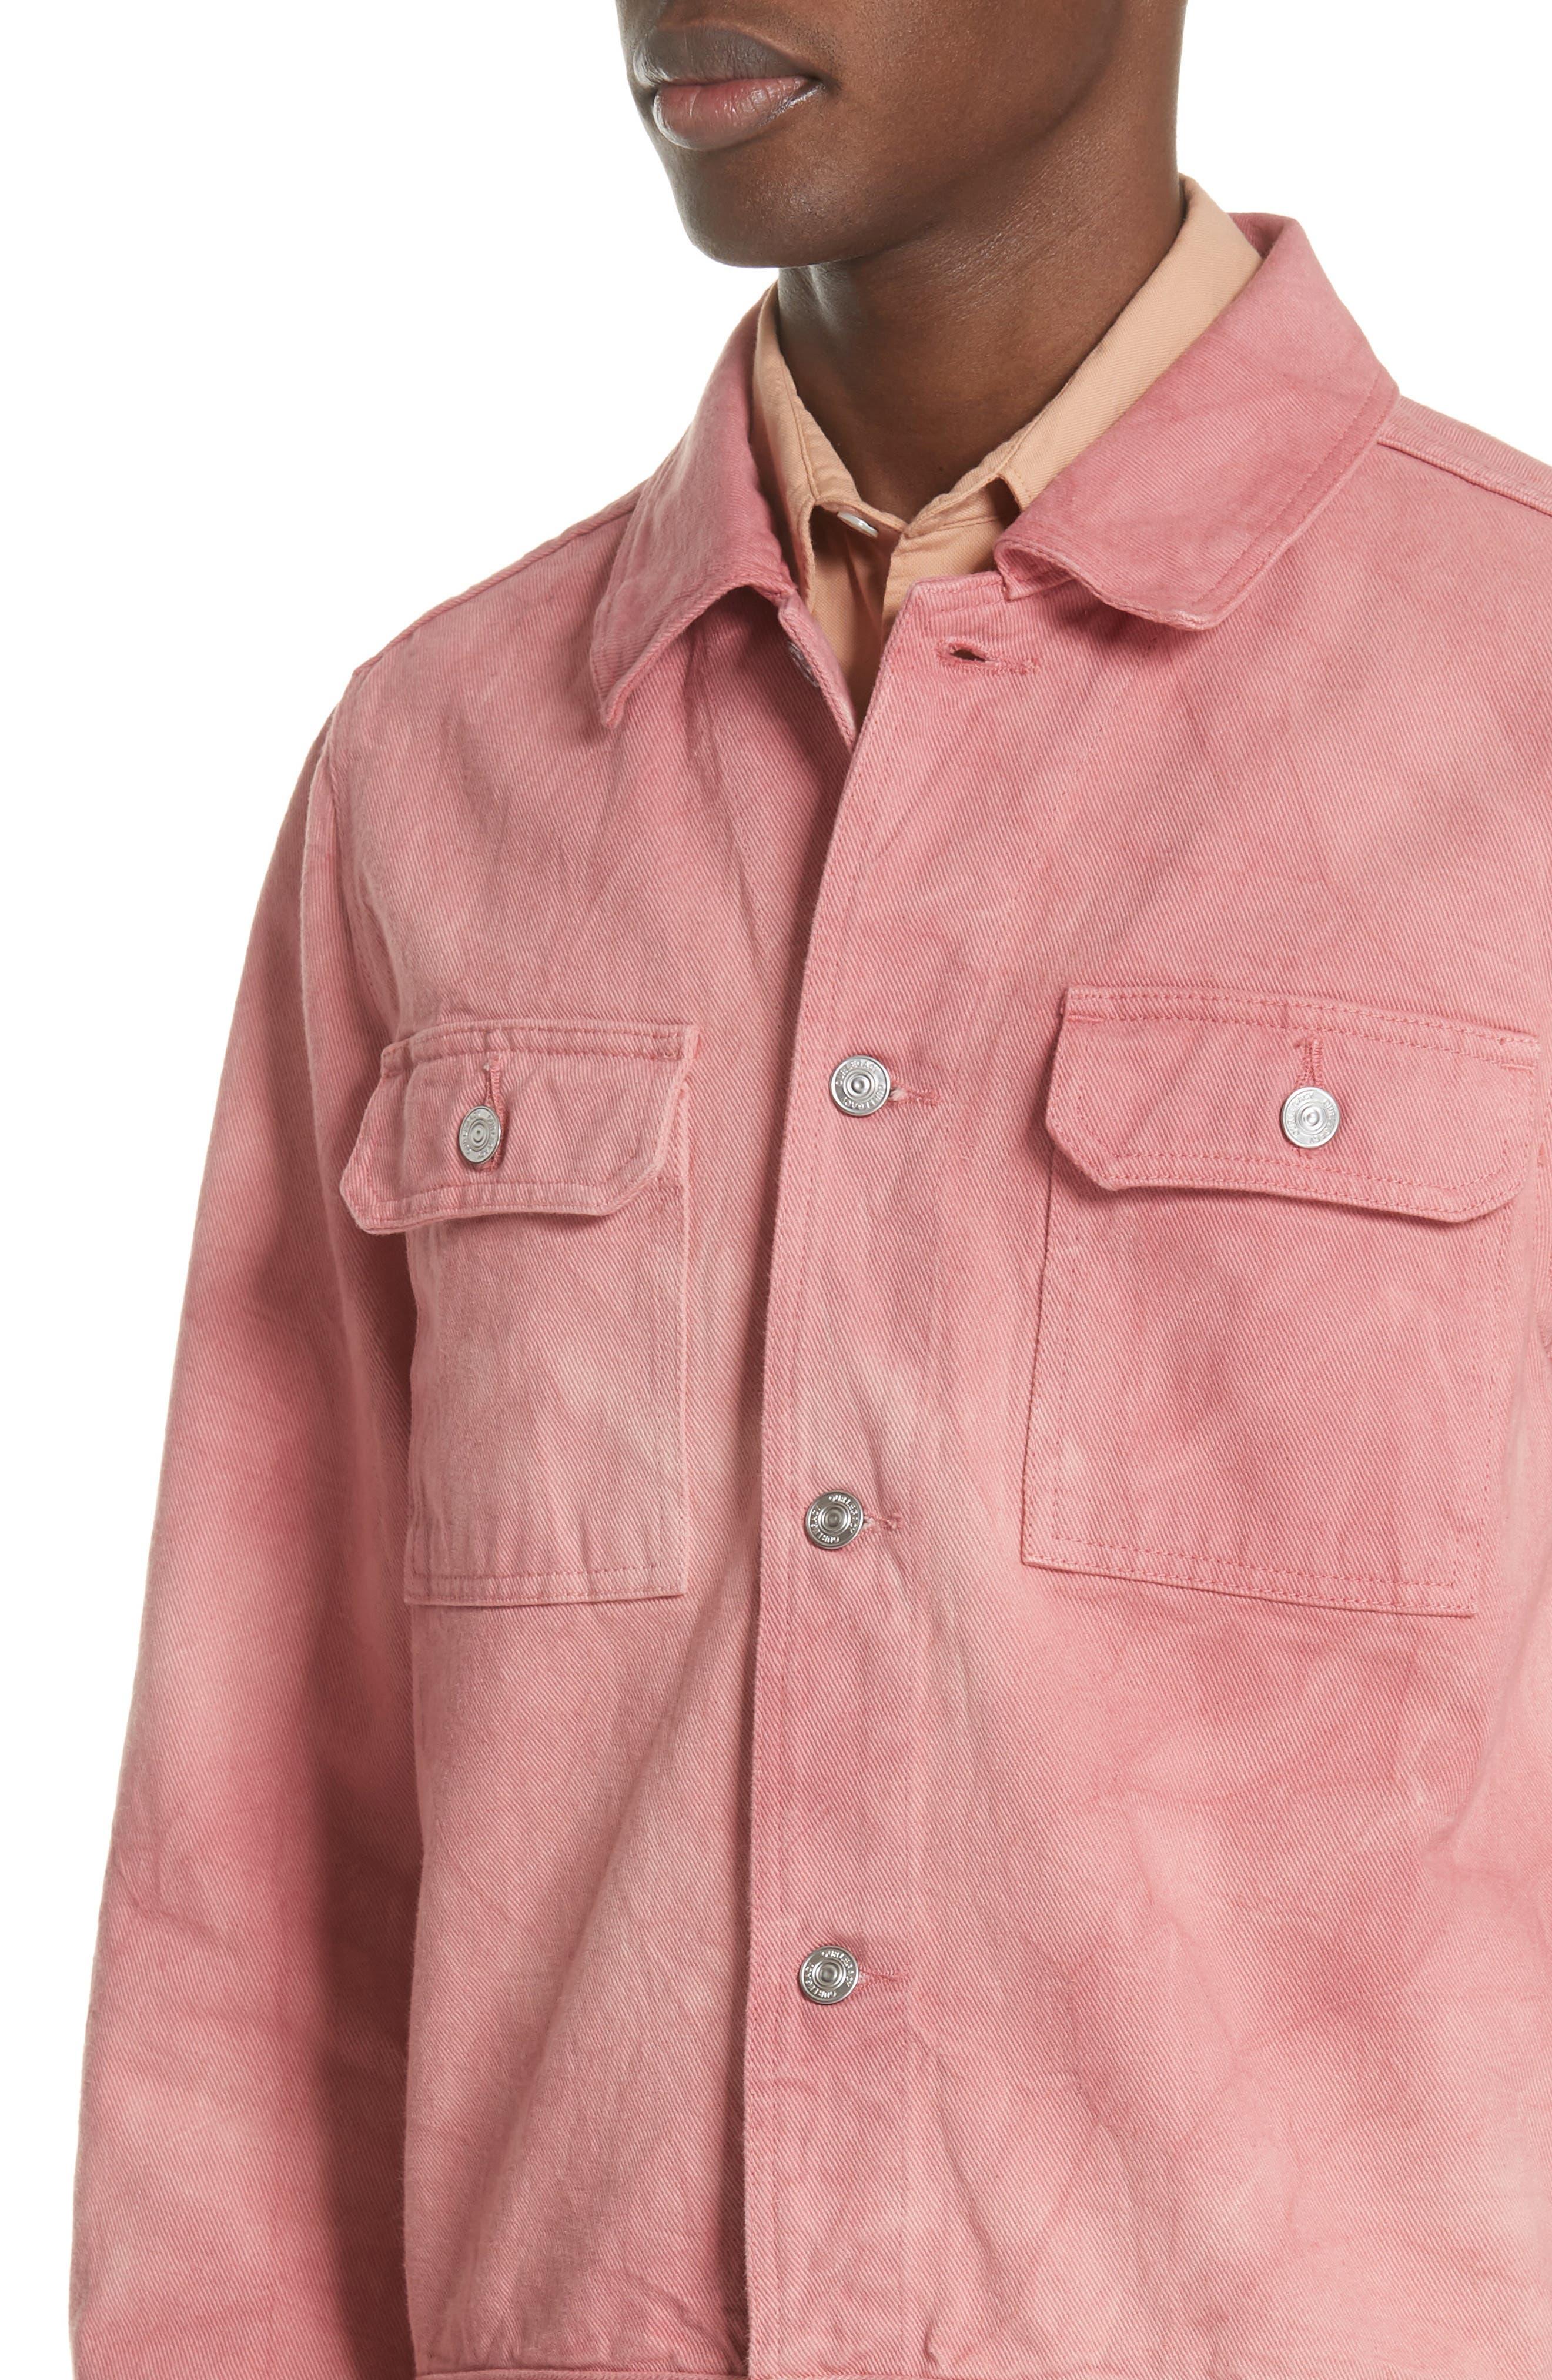 Dye Jacket,                             Alternate thumbnail 4, color,                             650